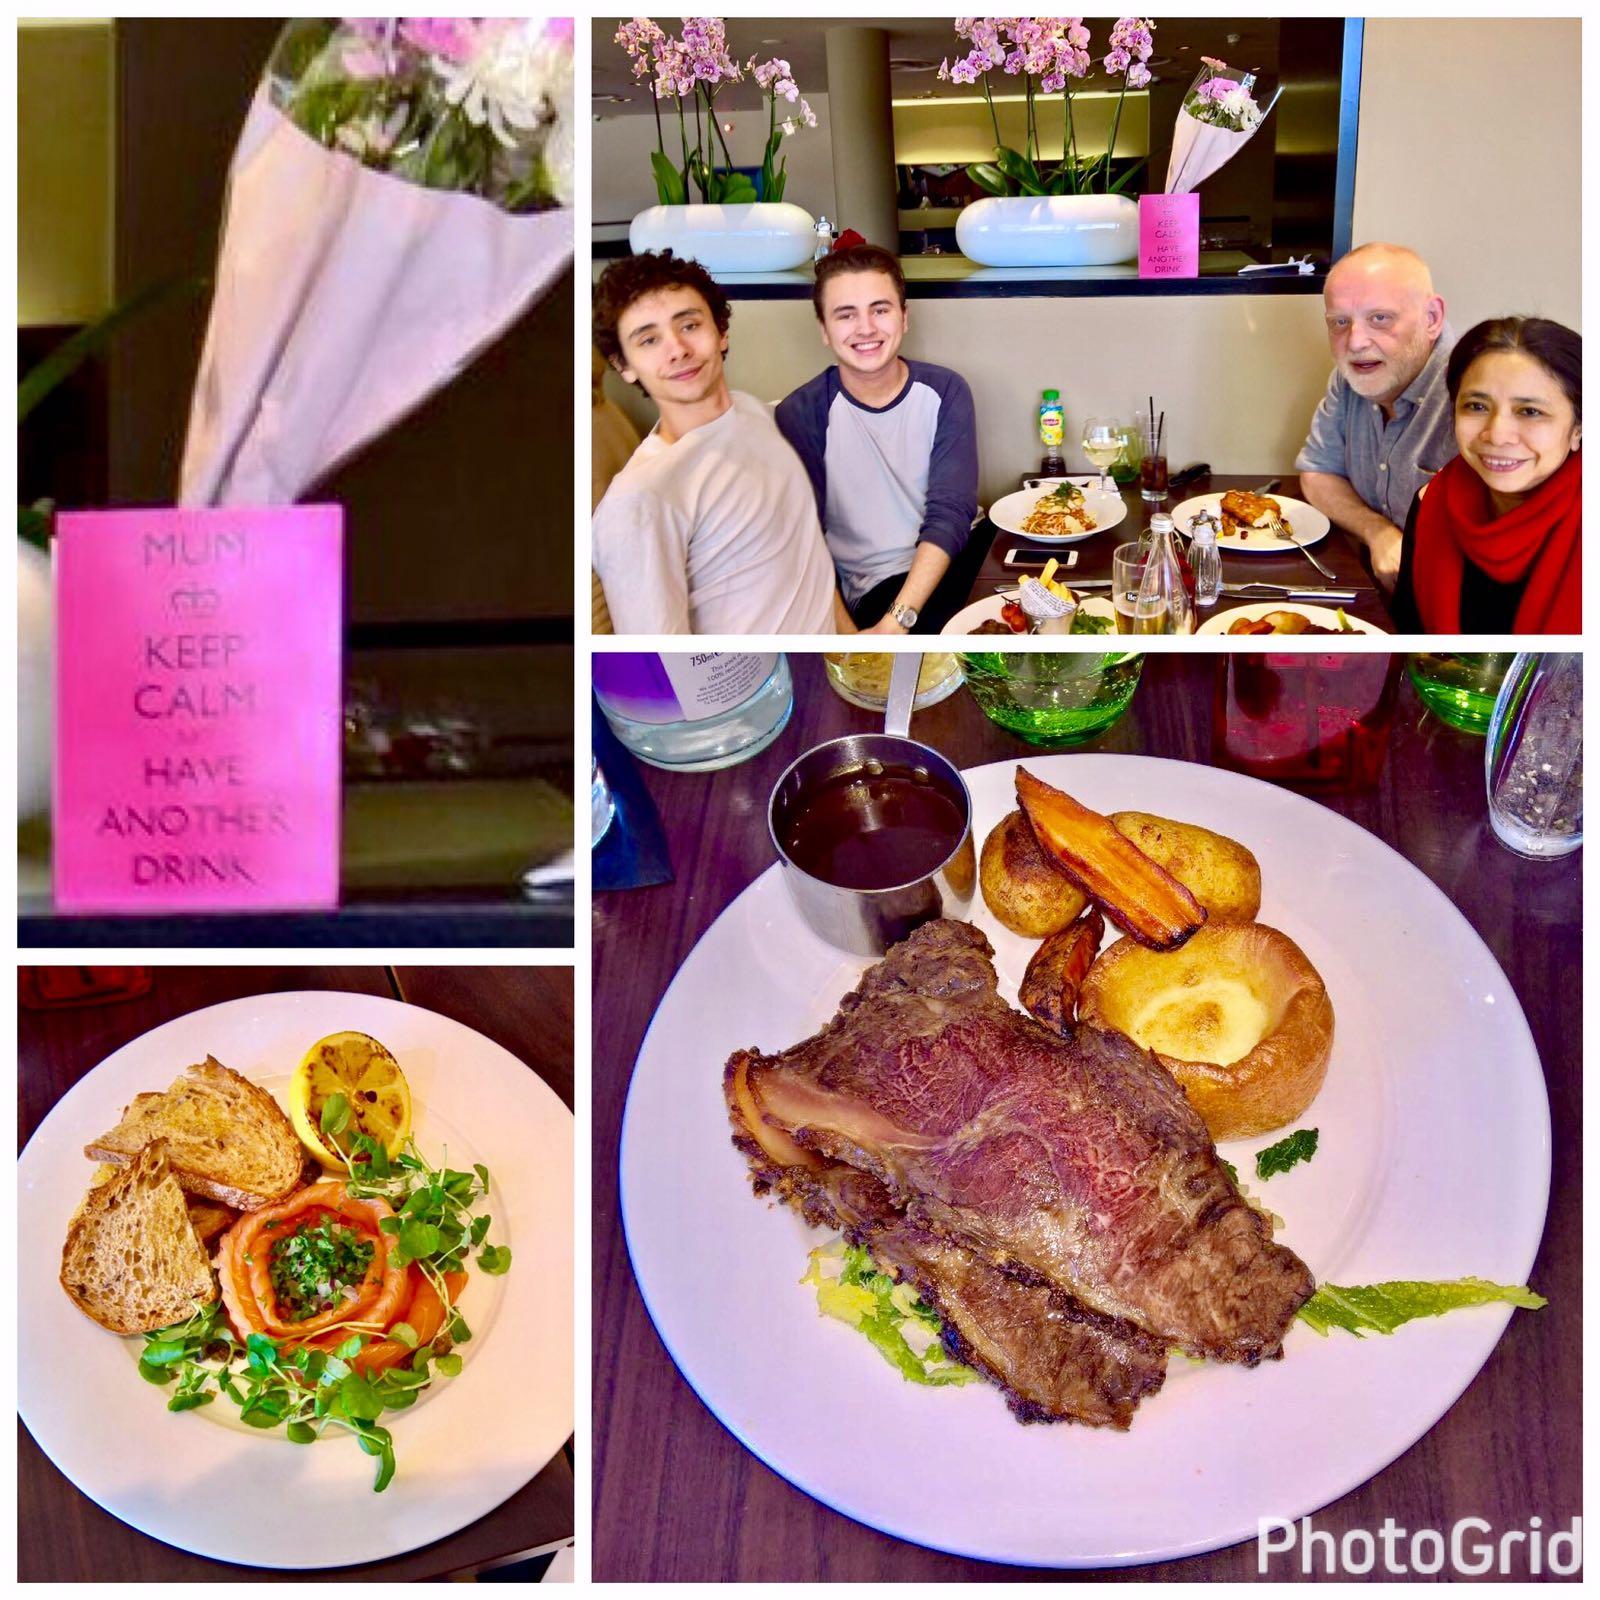 Mother's Day Sunday Roast- Brasserie, Tower Hotel, London